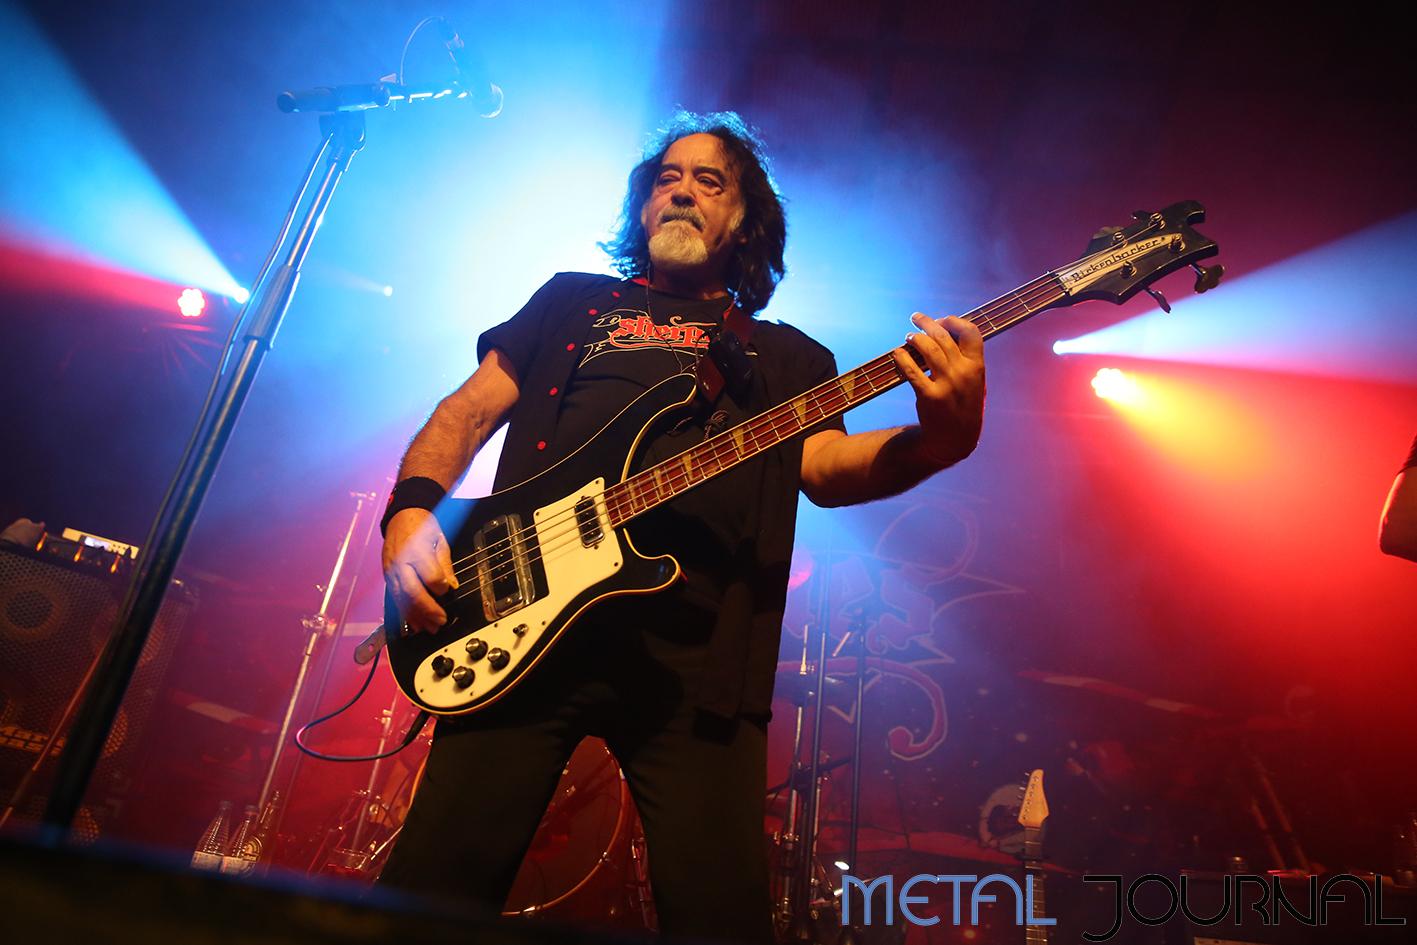 los barones - metal journal bilbao 2019 pic 5